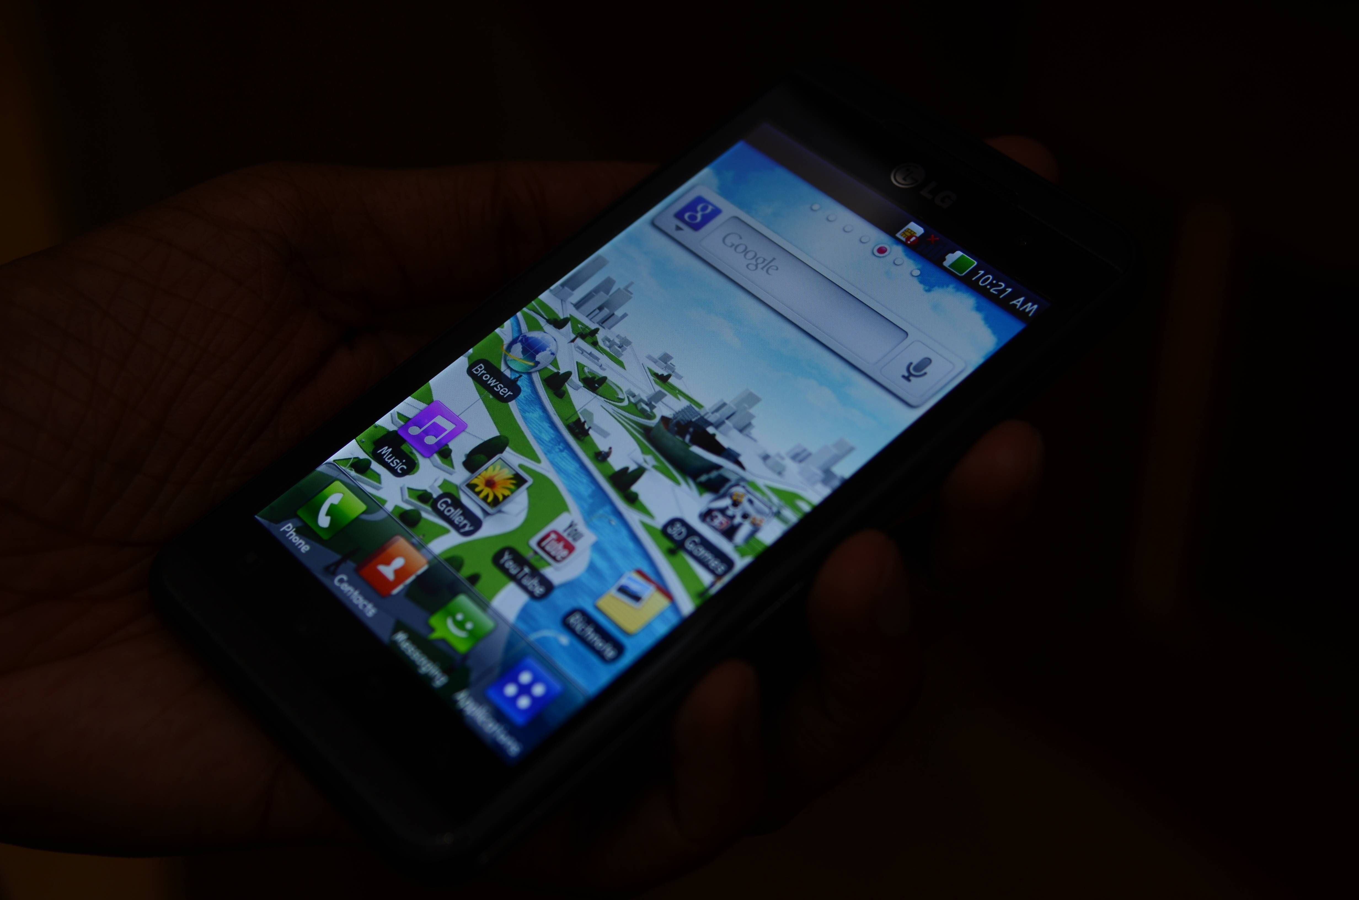 LG Optimus 3D Max Review Digitin